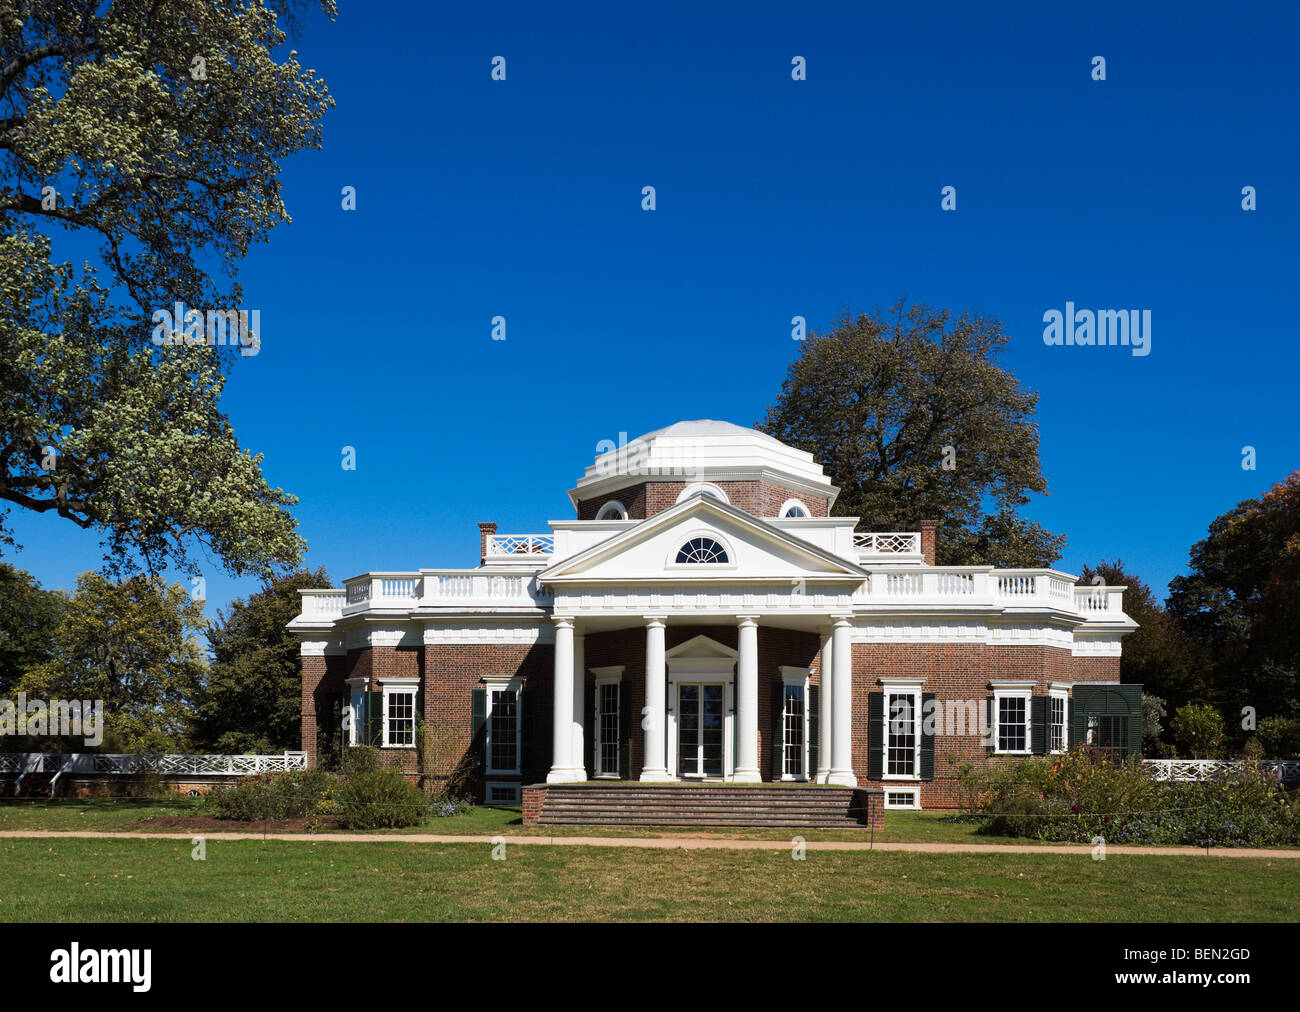 Das Haus von Thomas Jefferson, Monticello, Charlottesville, Virginia, USA Stockbild